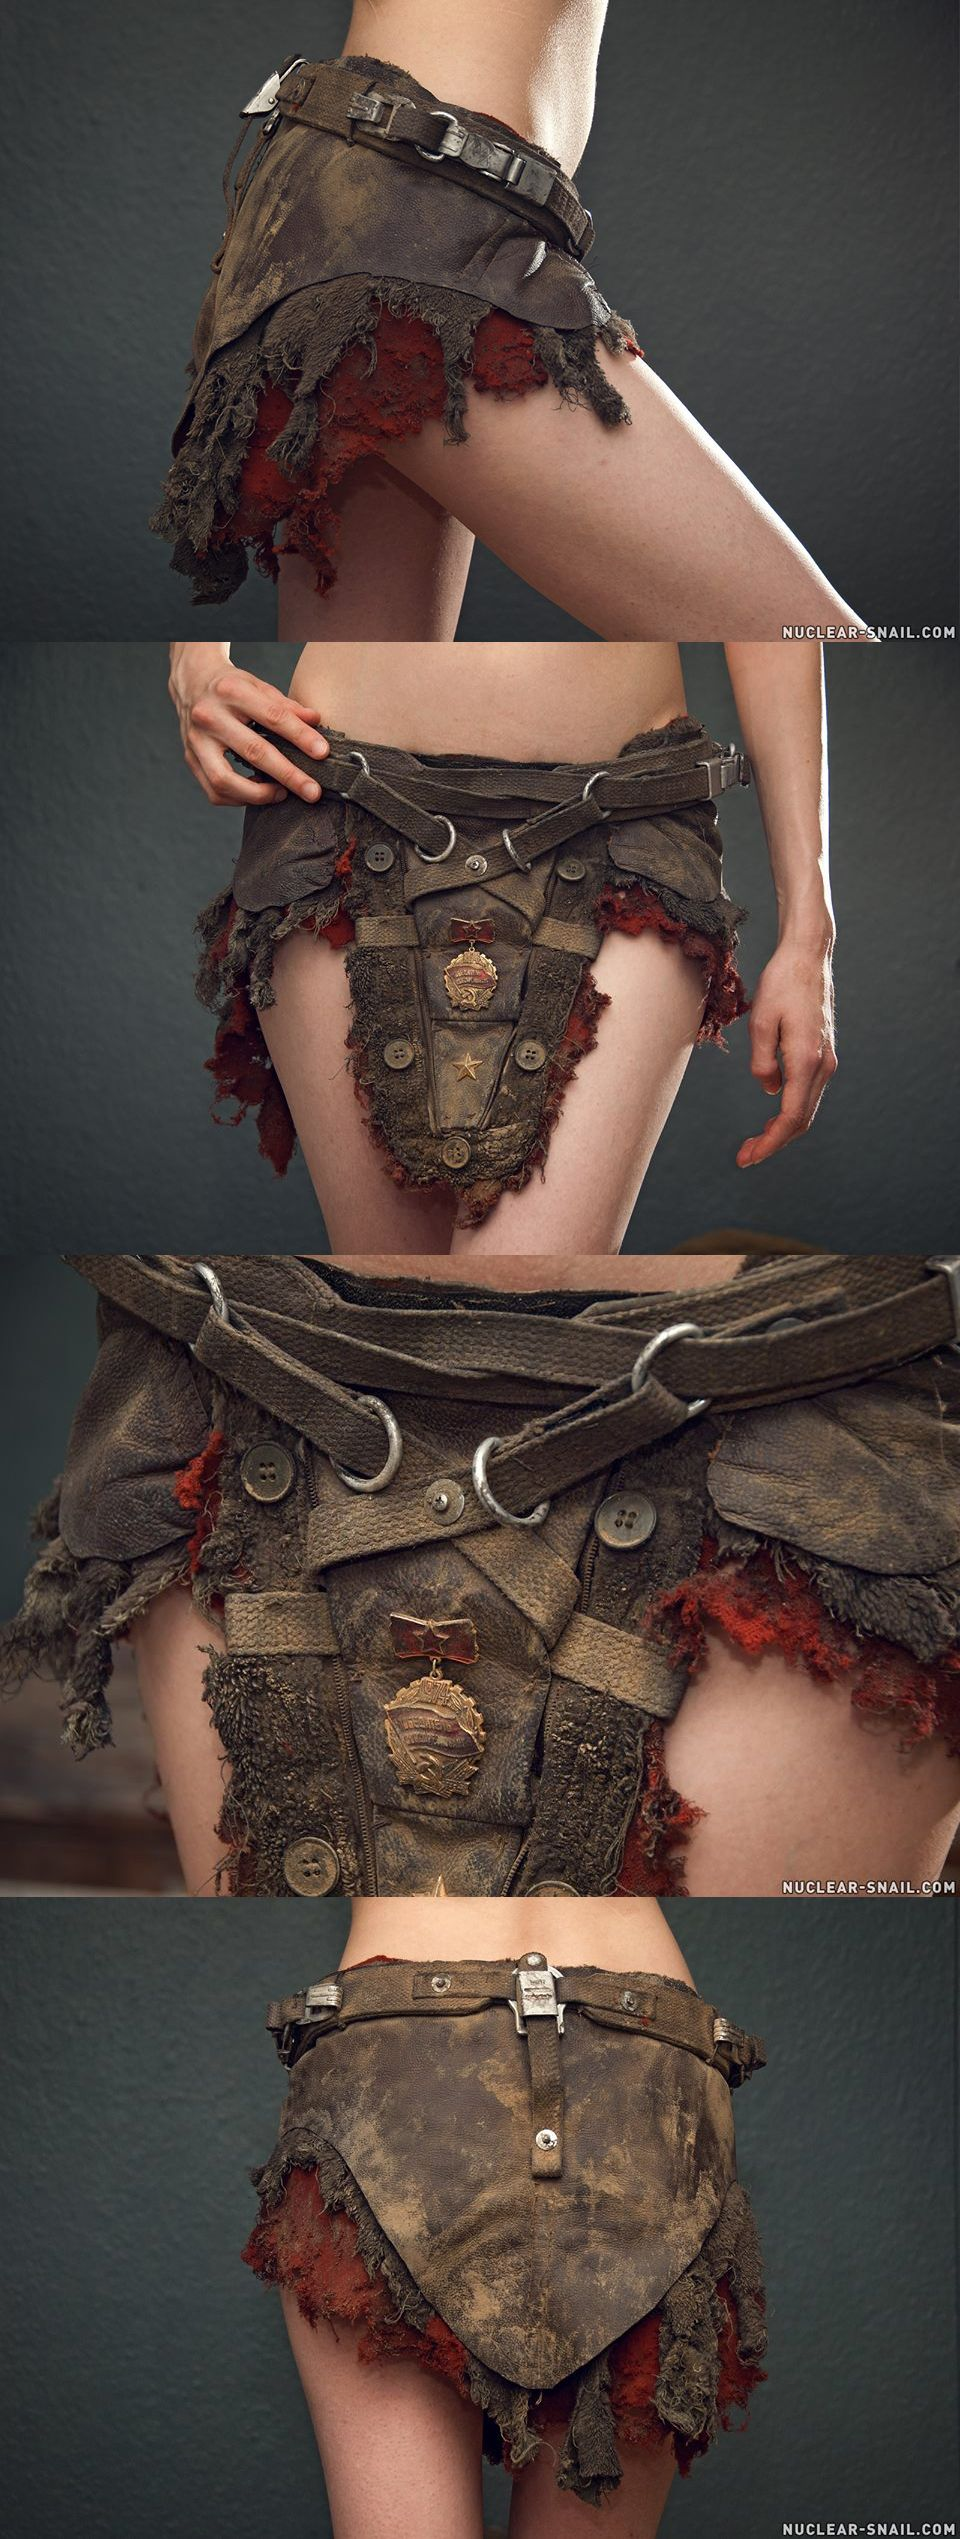 Wasteland russian skirt - nuclear snails https://www.facebook.com/nuclear.snail